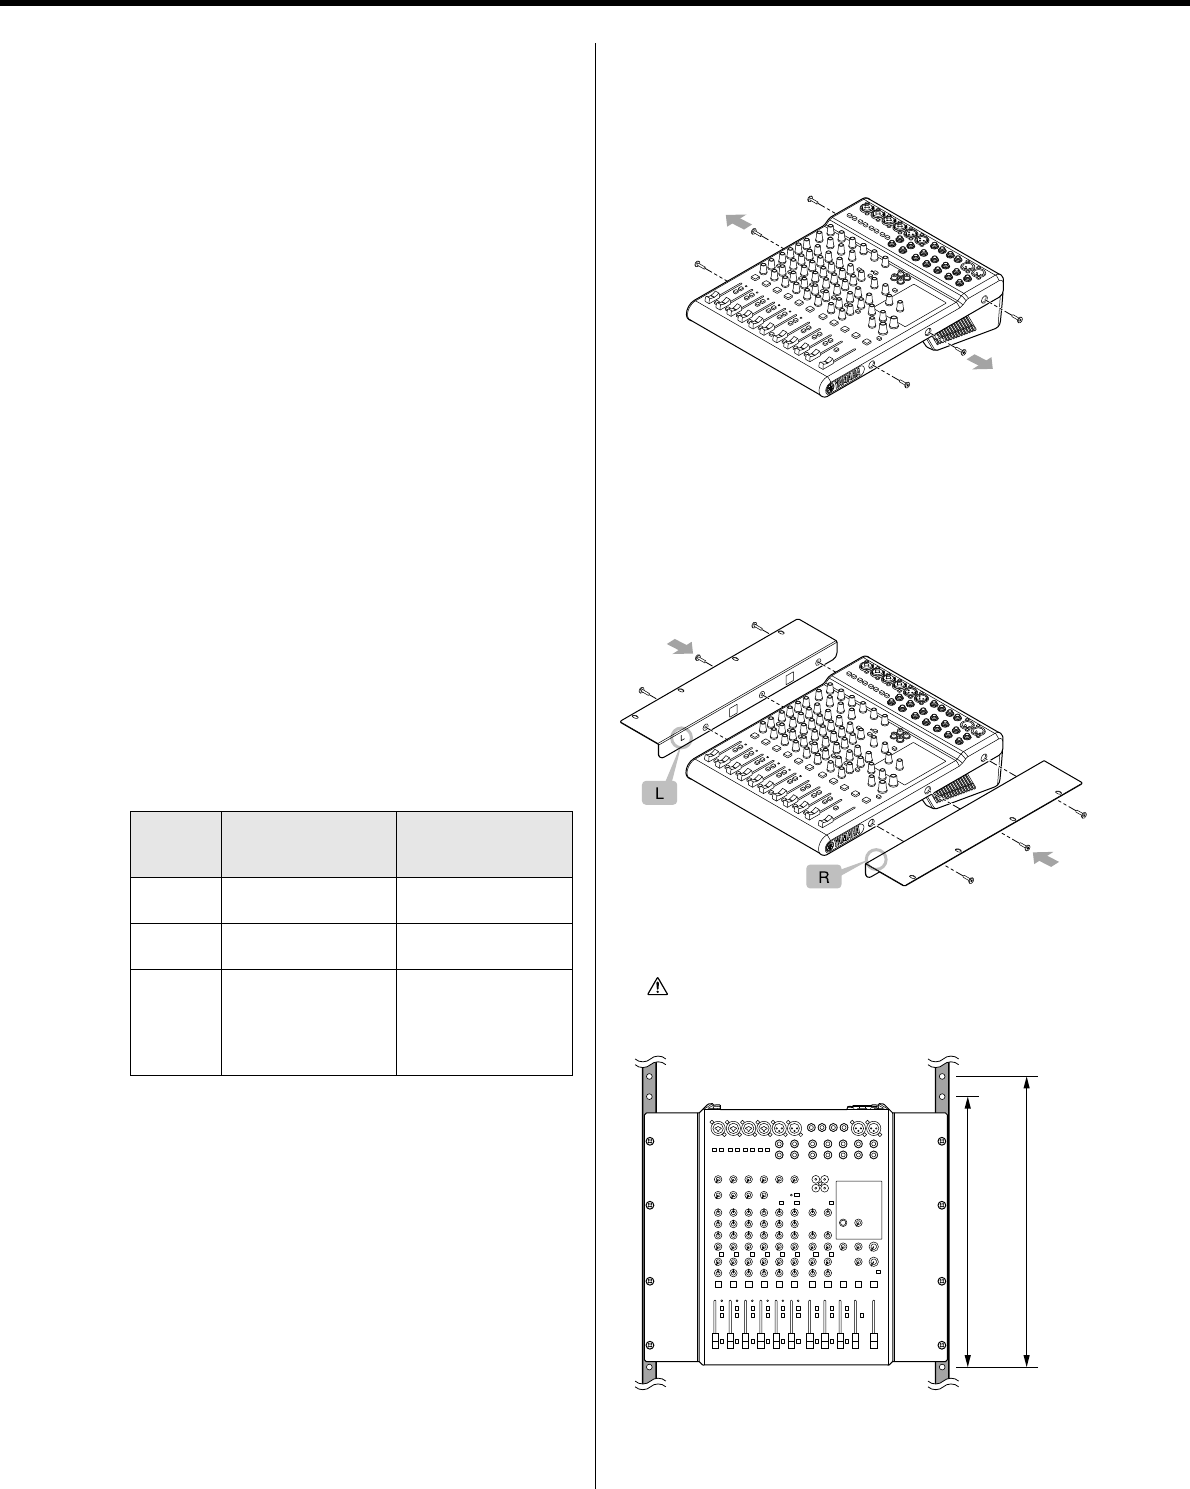 Yamaha MG20XU/MG20/MG16XU/MG16/MG12XU/MG12 Owner's Manual